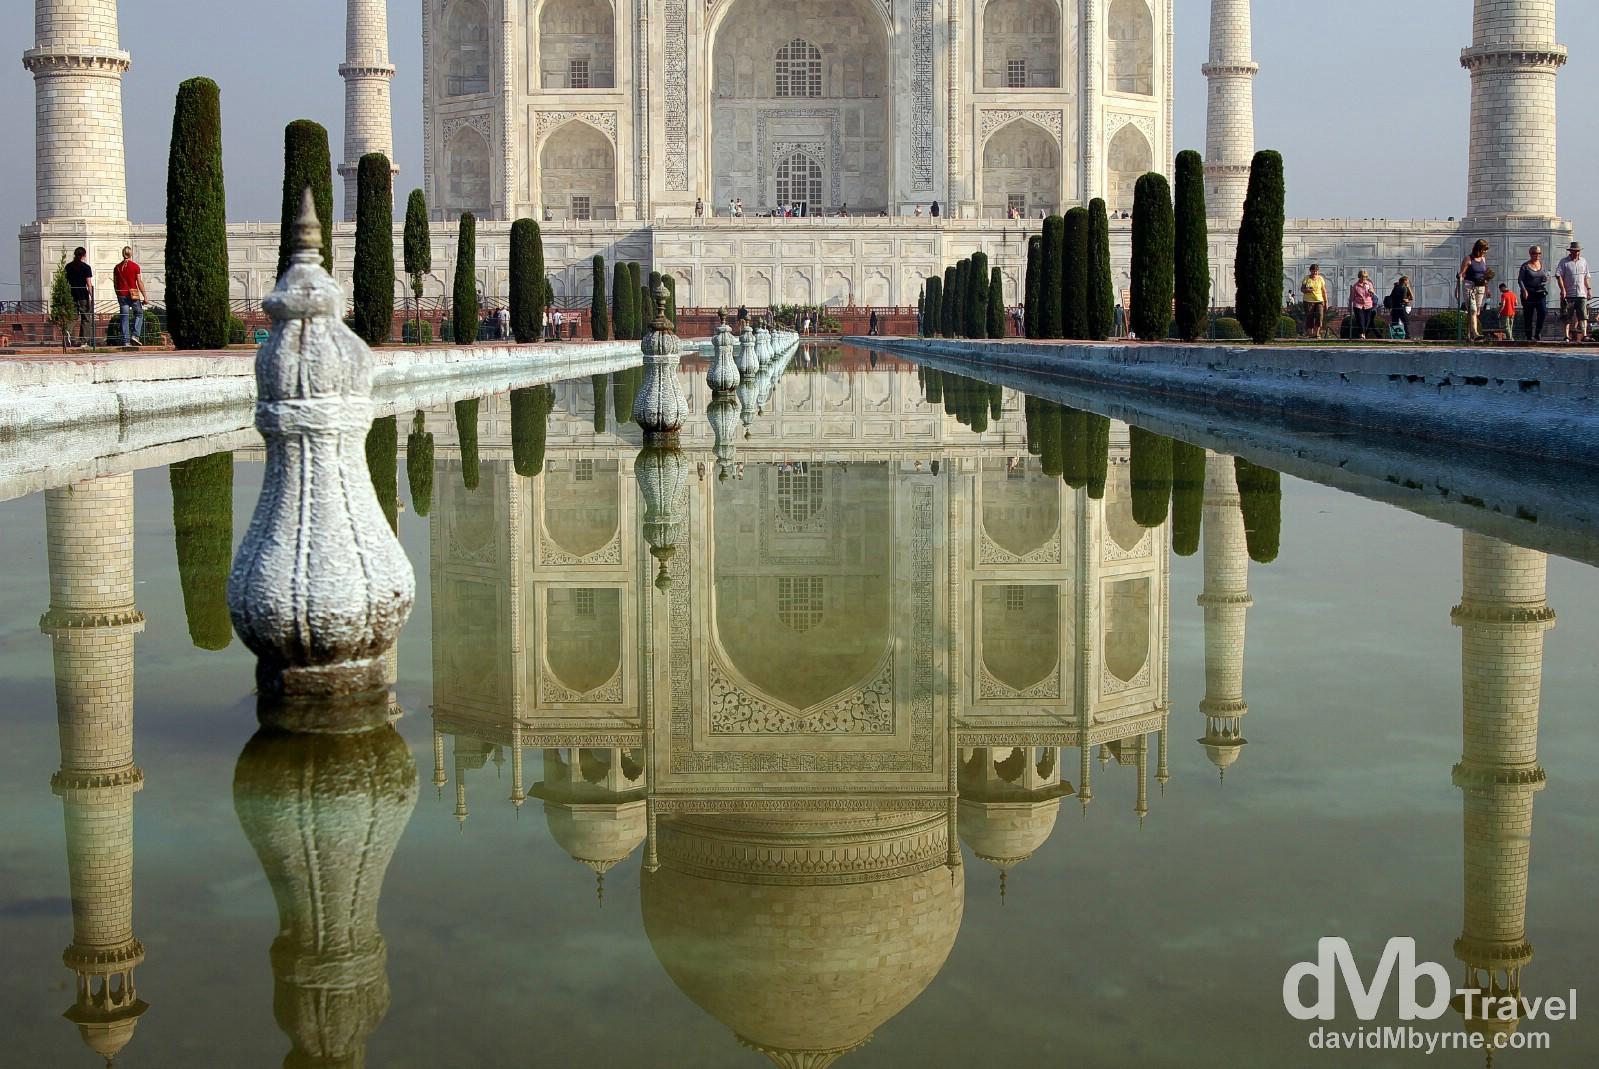 The Taj Mahal as seen reflected in the ornamental garden pool fronting it. Agra, Uttar Pradesh, India. October 11th 2012.